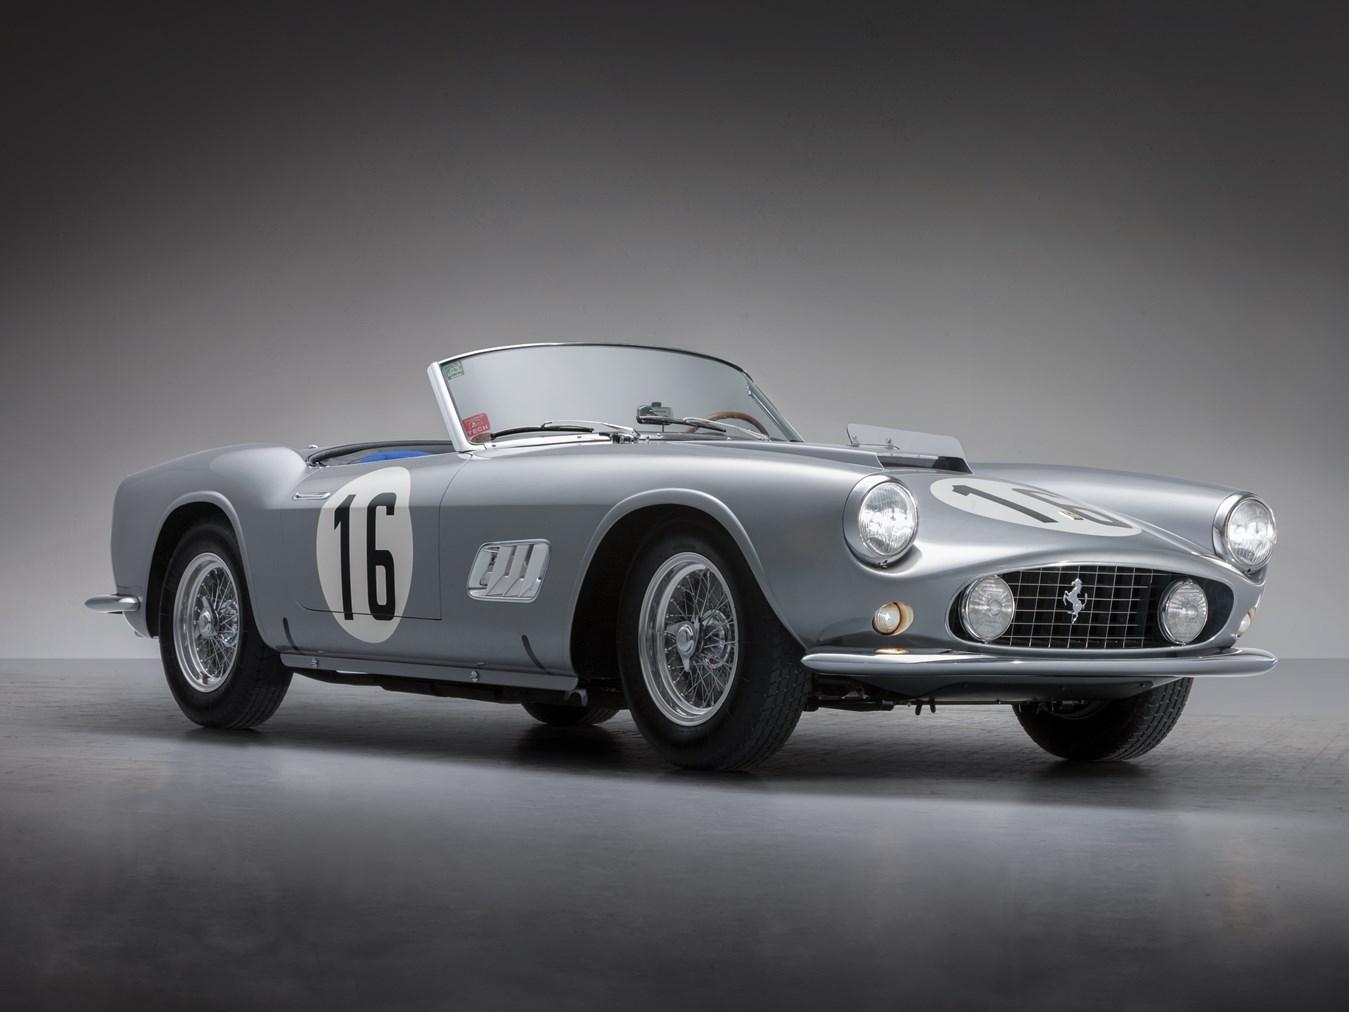 Sale 18m Alloy Ferrari Lwb Cal Spider Competizione Leads Rm Sotheby S Icons Sale Findart Cc